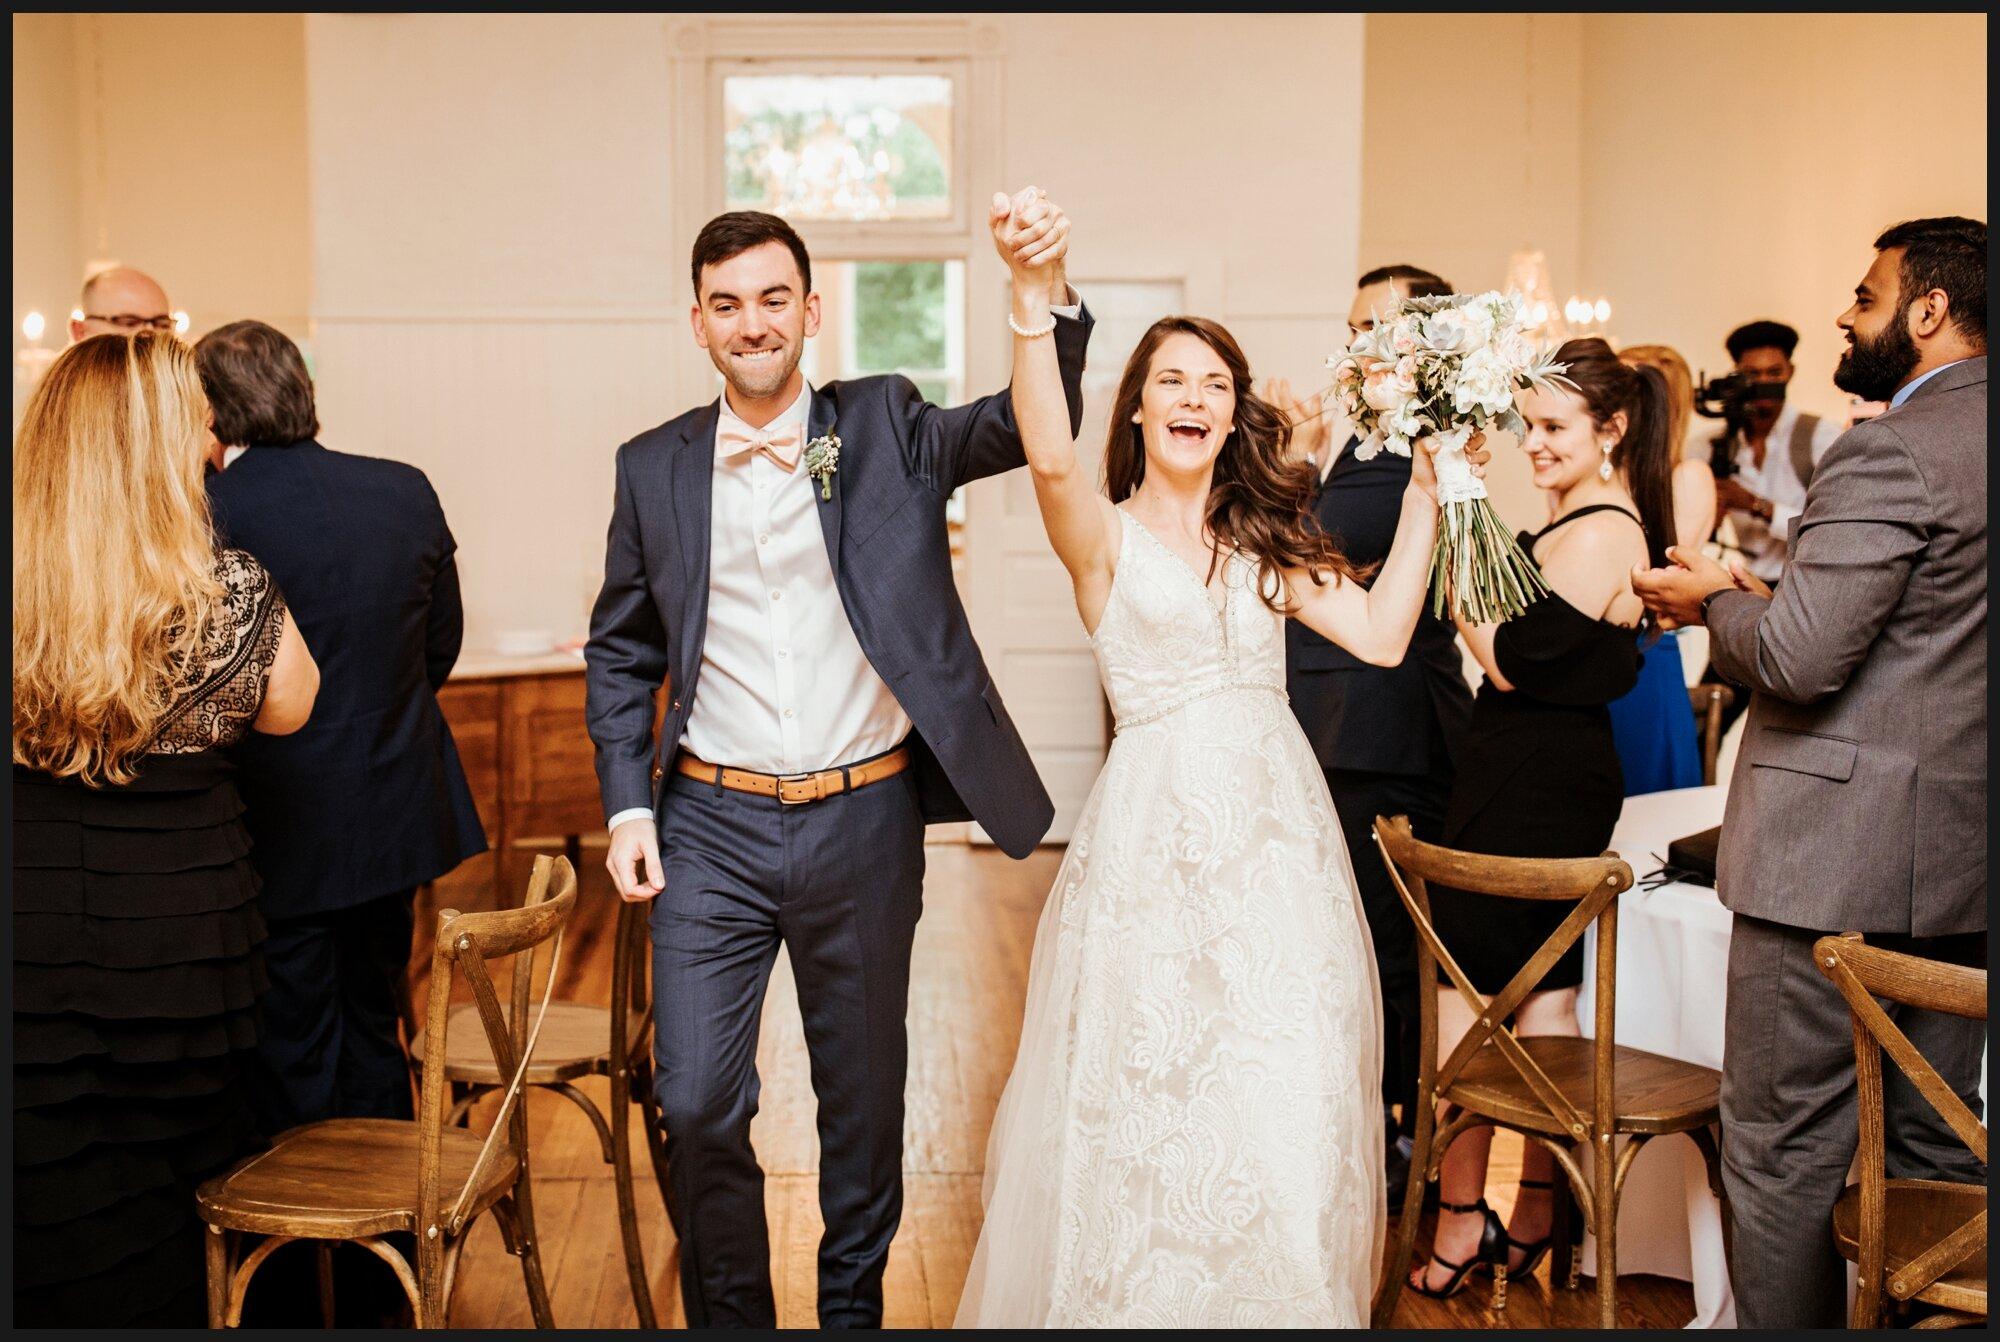 Orlando-Wedding-Photographer-destination-wedding-photographer-florida-wedding-photographer-hawaii-wedding-photographer_0689.jpg